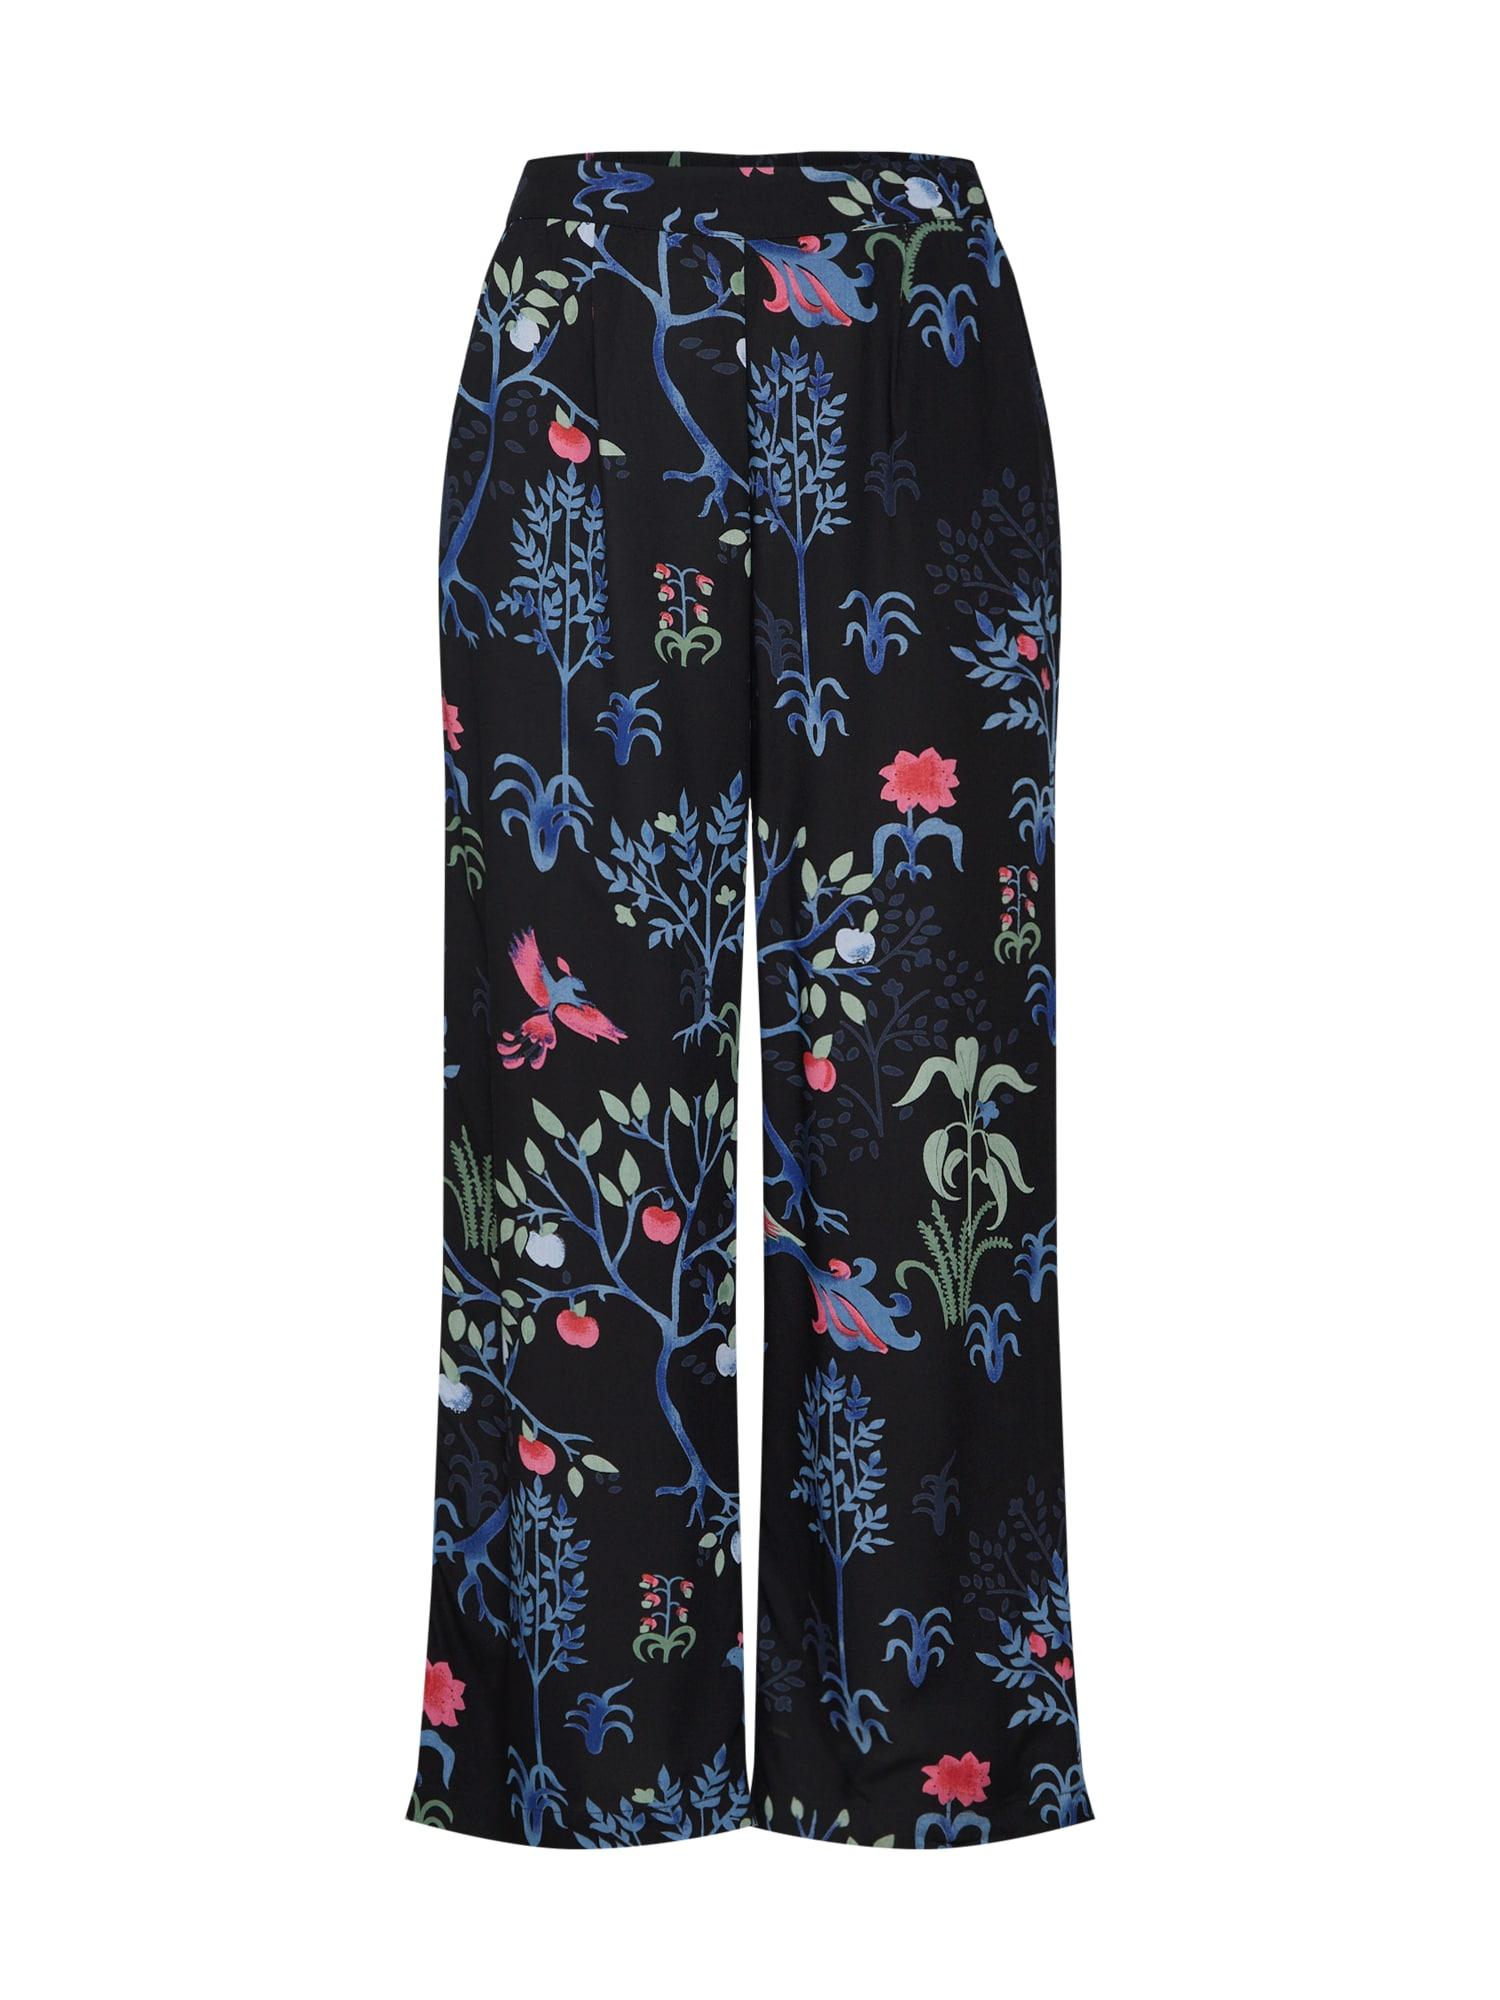 Kalhoty se sklady v pase BIRDIE CARLIE mix barev černá VERO MODA